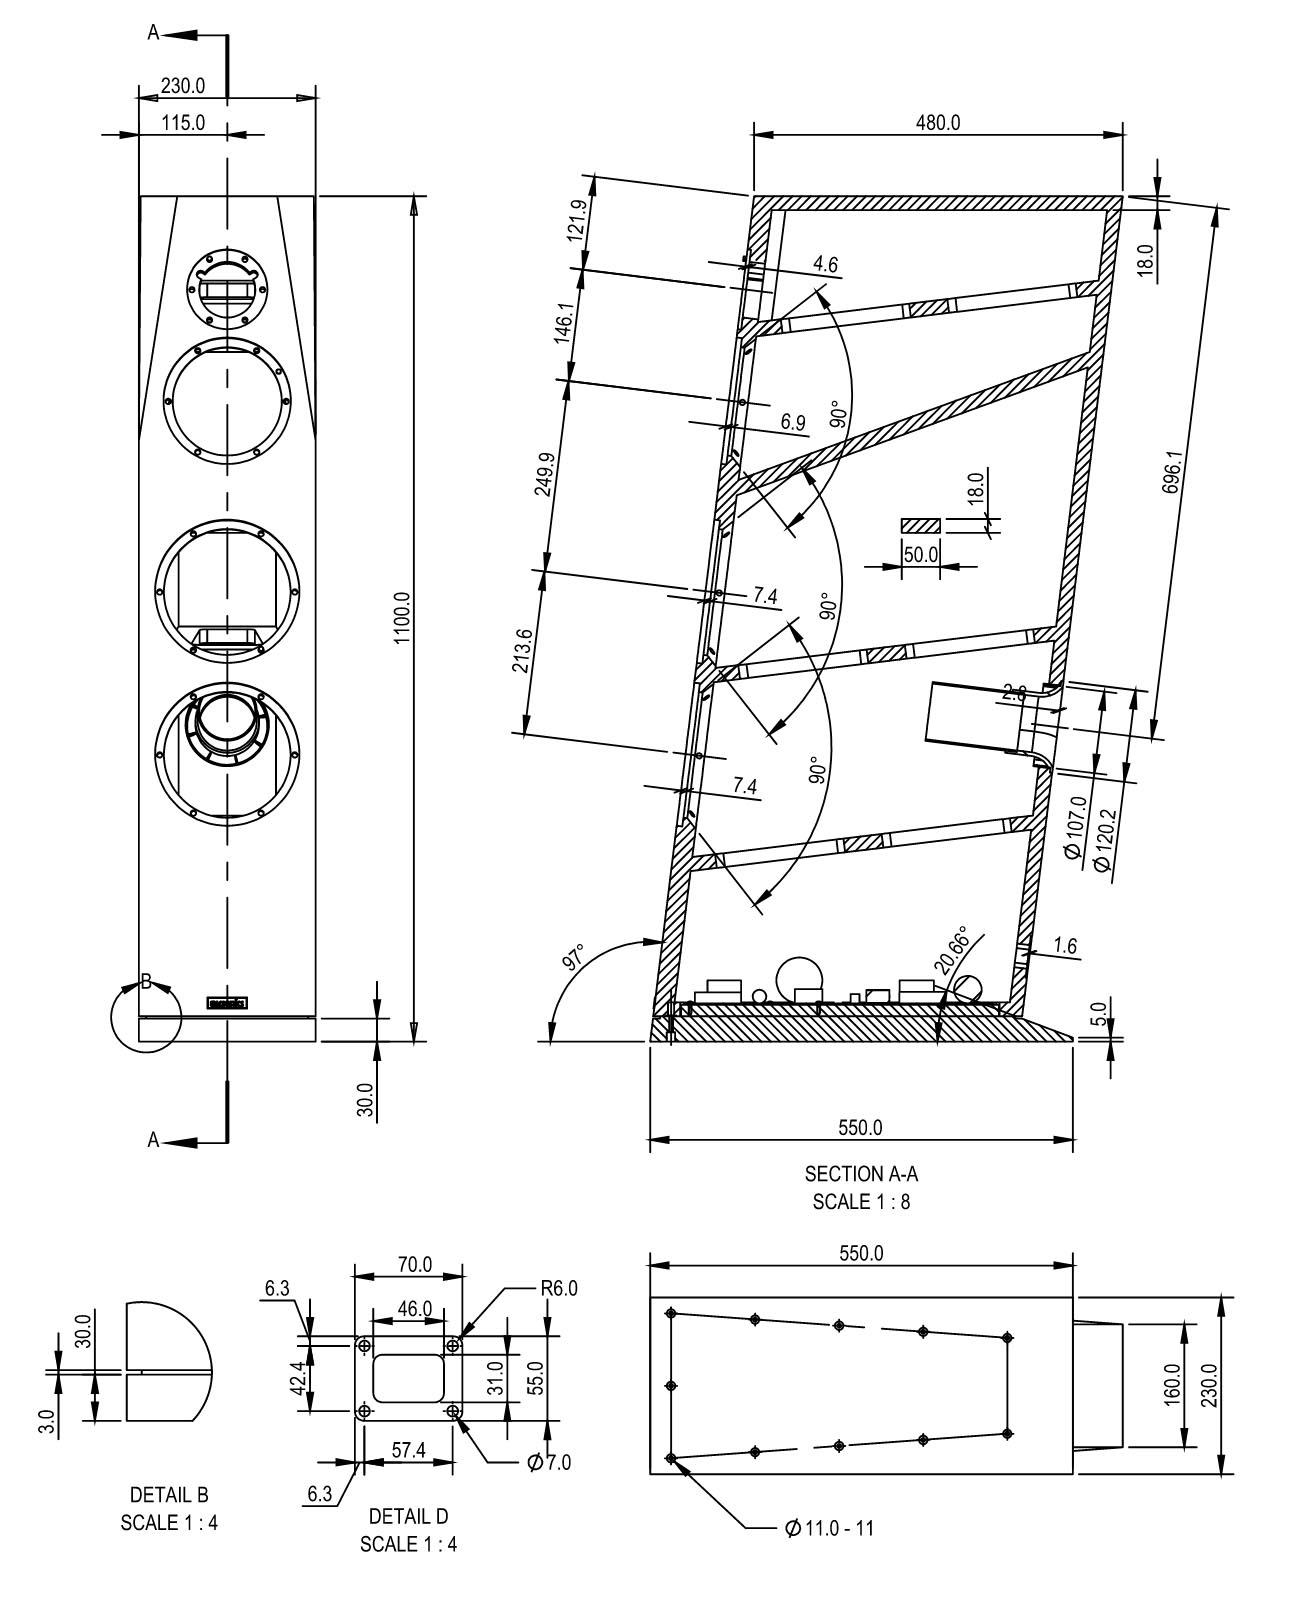 SB Acoustics Sasandu kit cabinet drawing